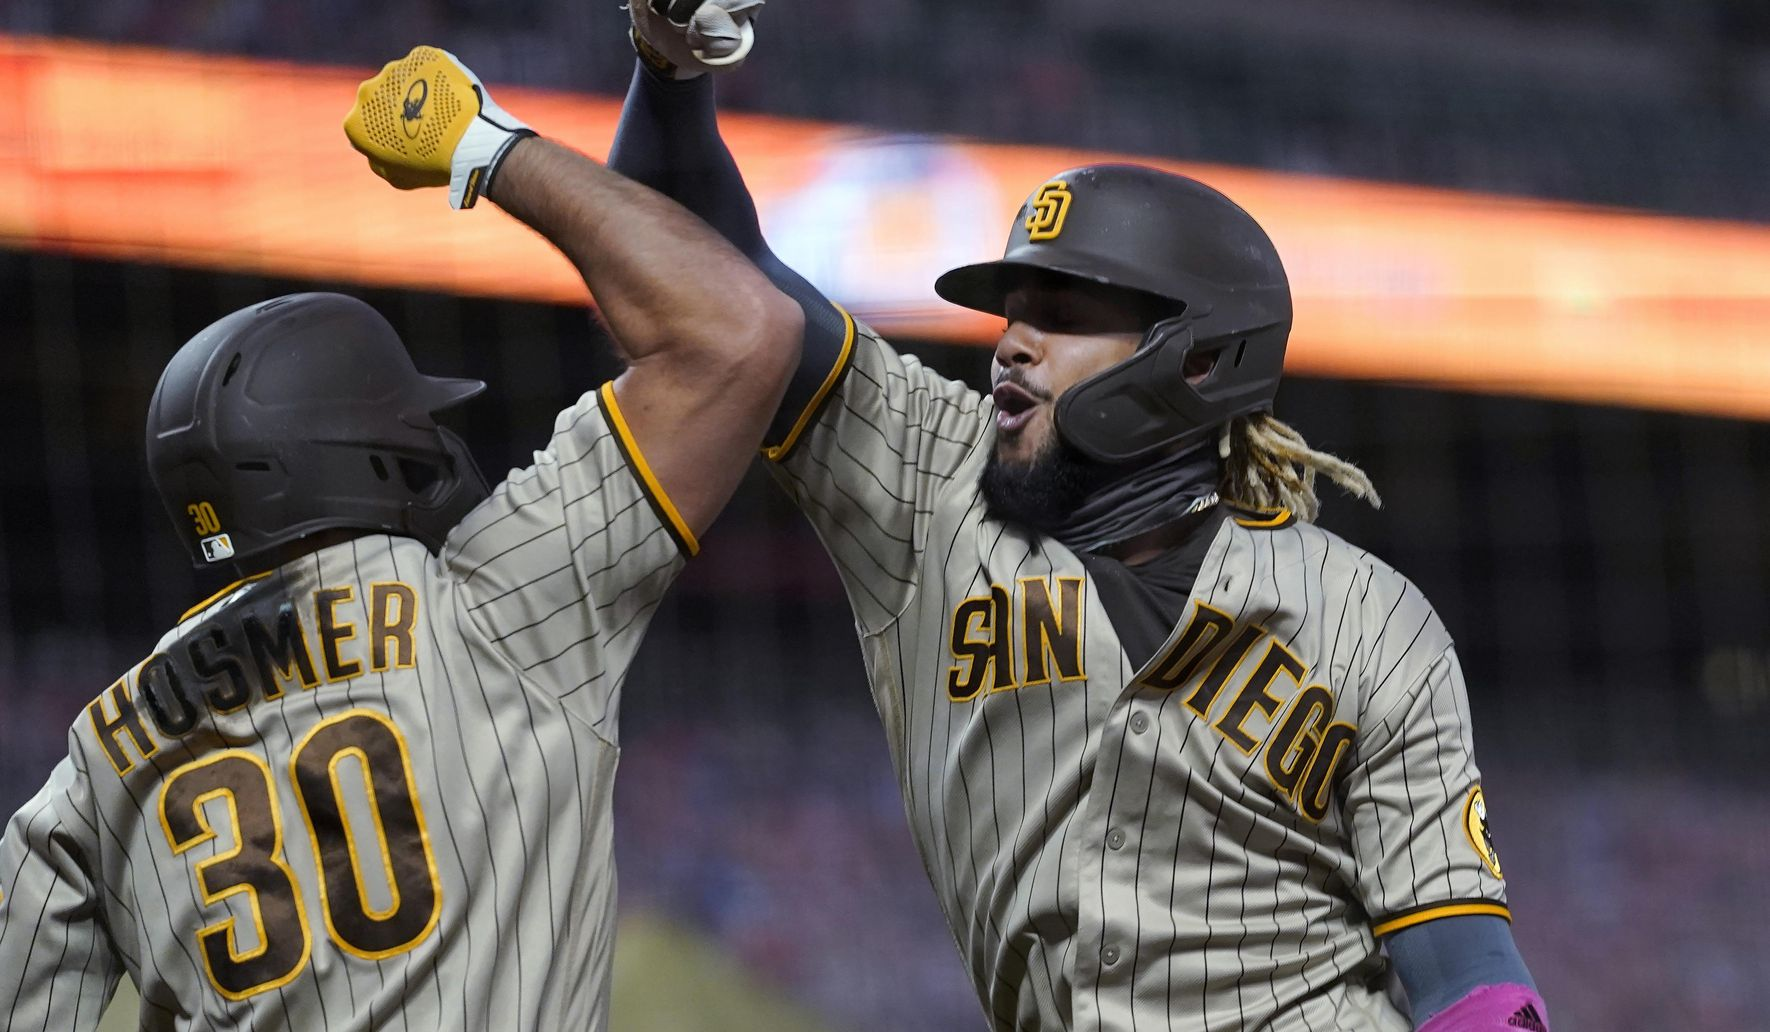 Padres_giants_baseball_85177_c0-176-4204-2627_s1770x1032